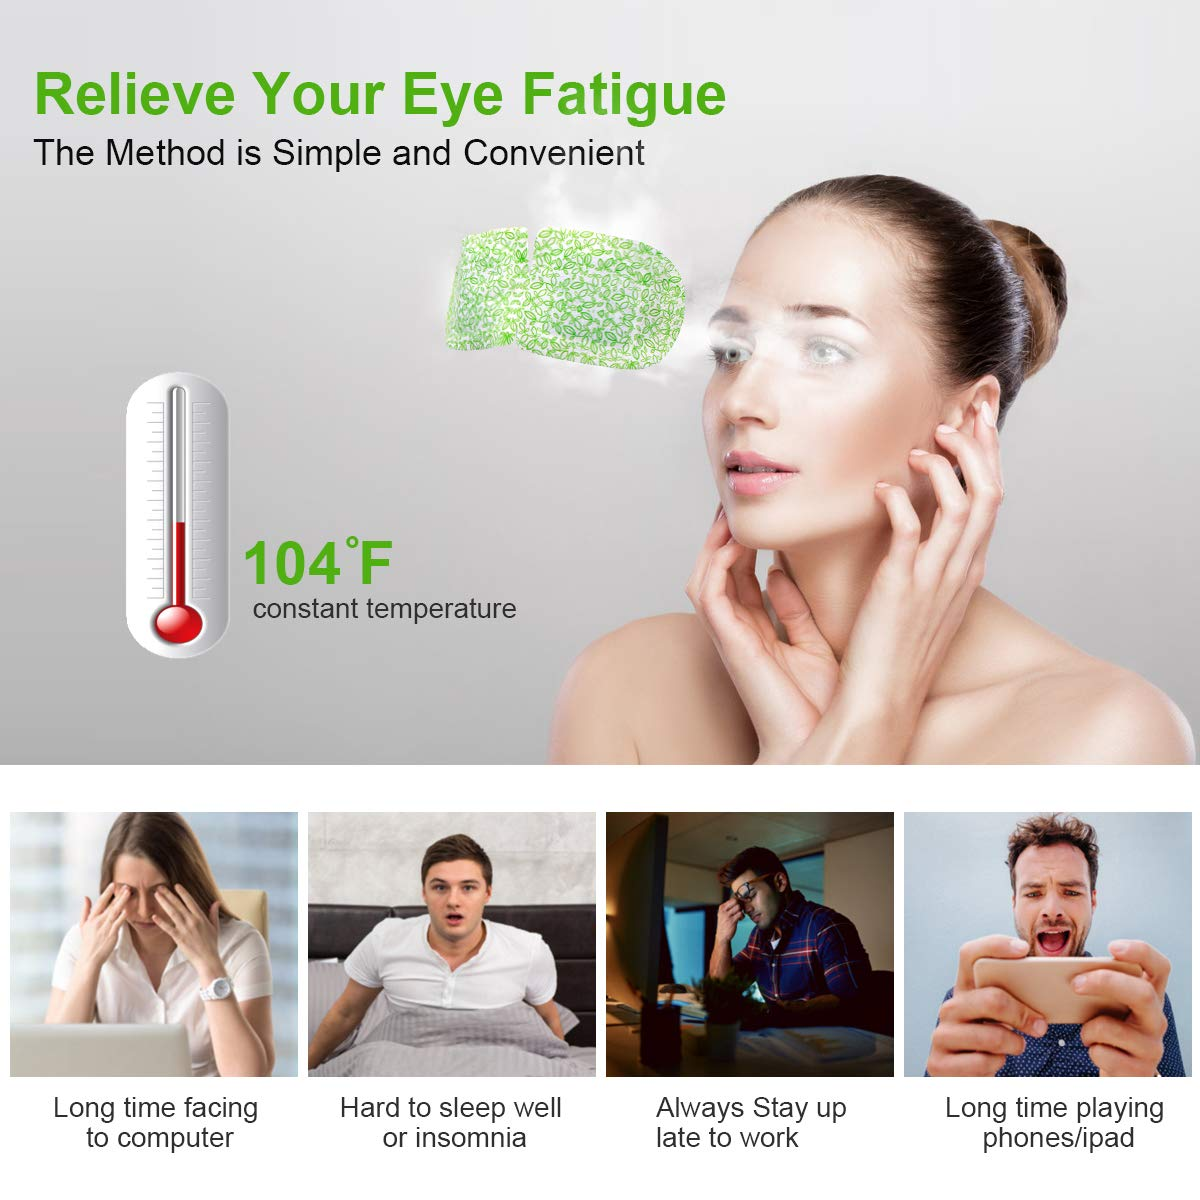 Steam Eye Masks, ProCIV 16PCS Warm Eye Mask, Hot Lavender Sleep Eye Mask for Dry Puffy Fatigue Eyes